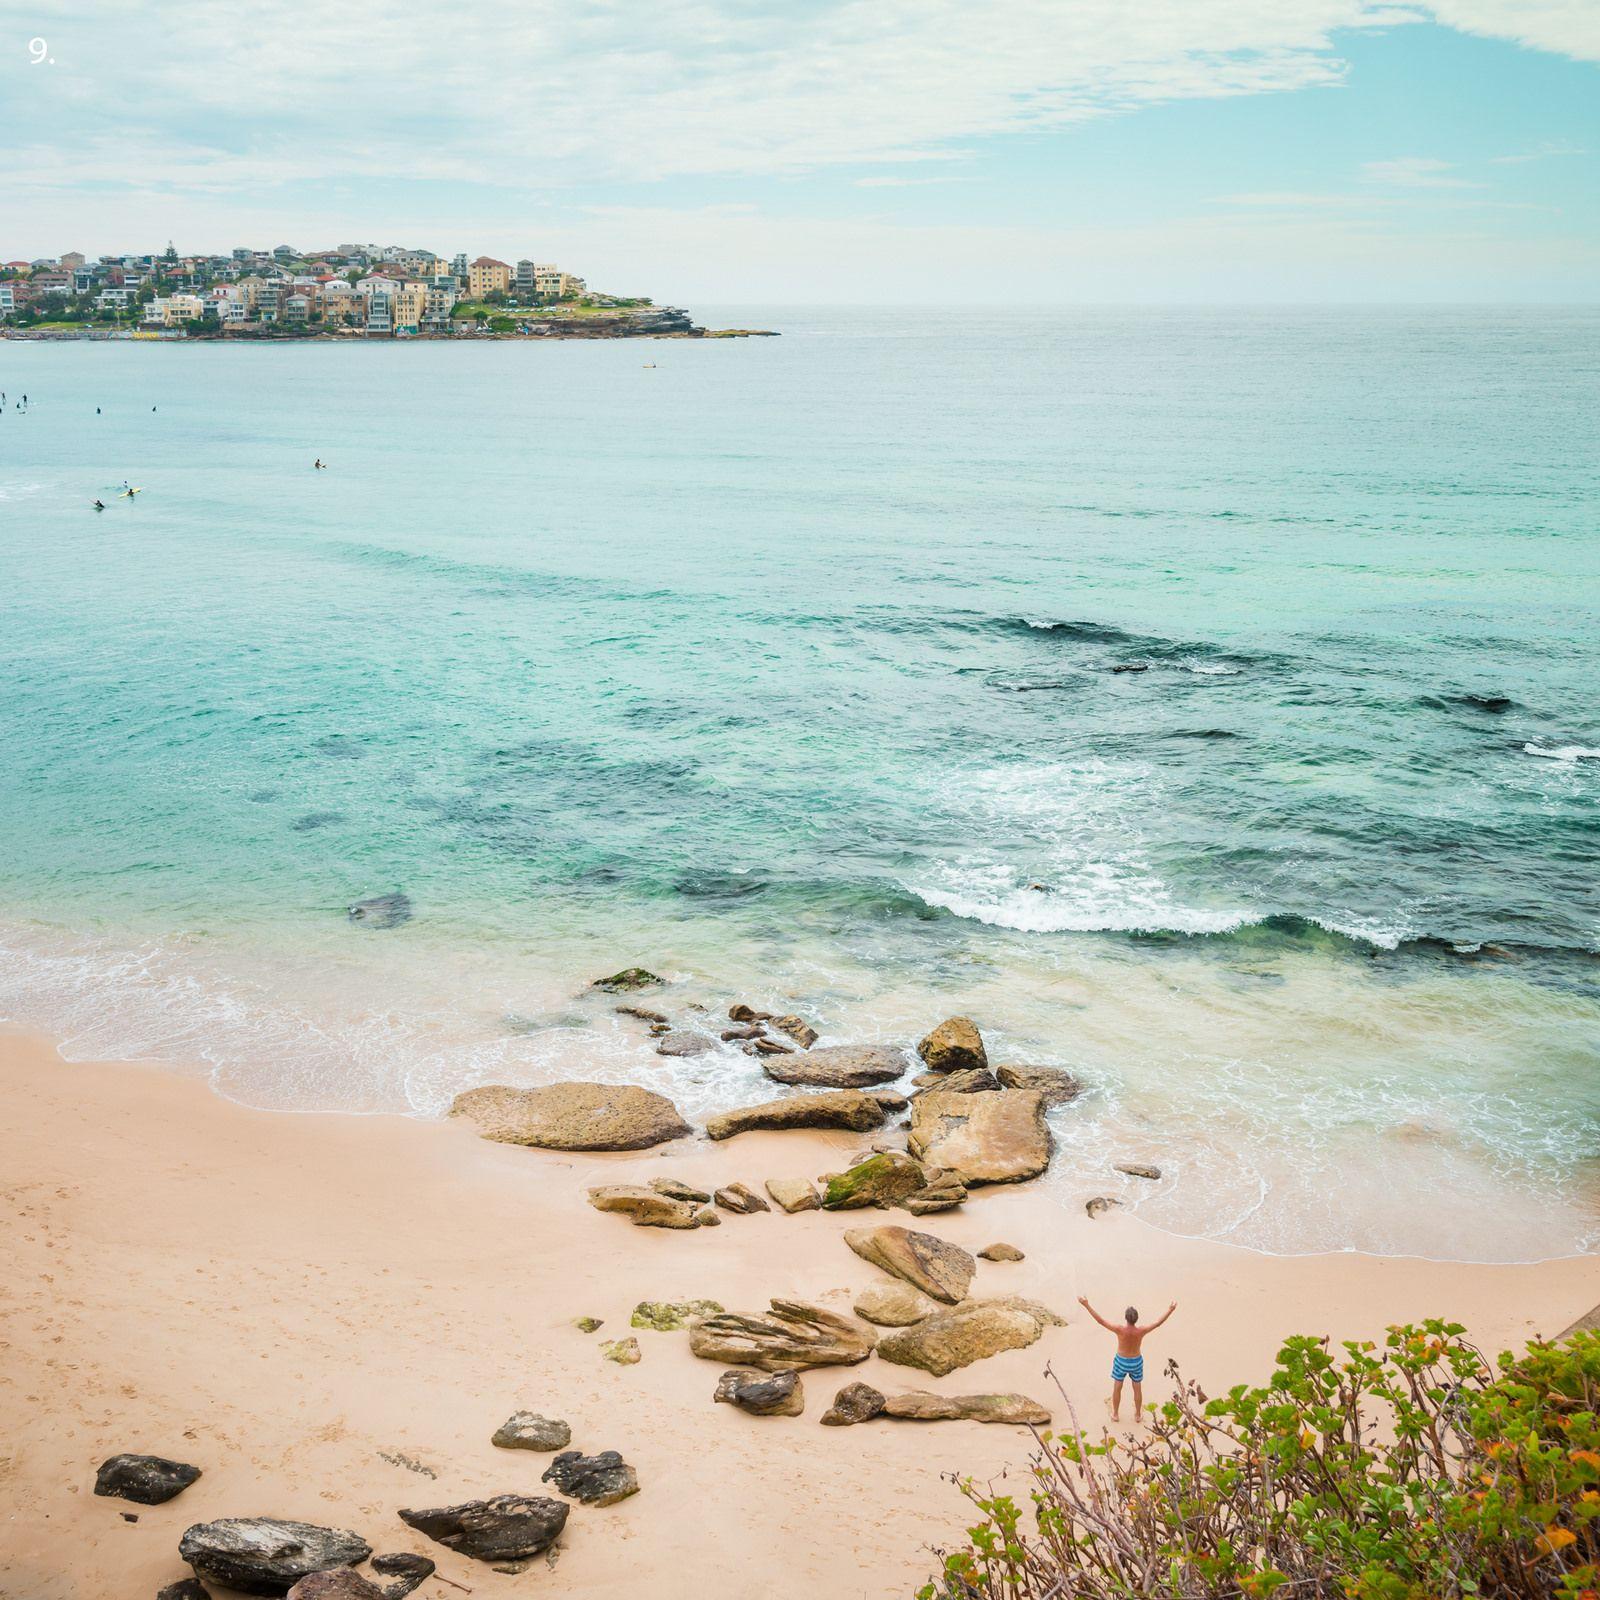 Beach Landscape Photography Landscape Photography Tips Travel Photography